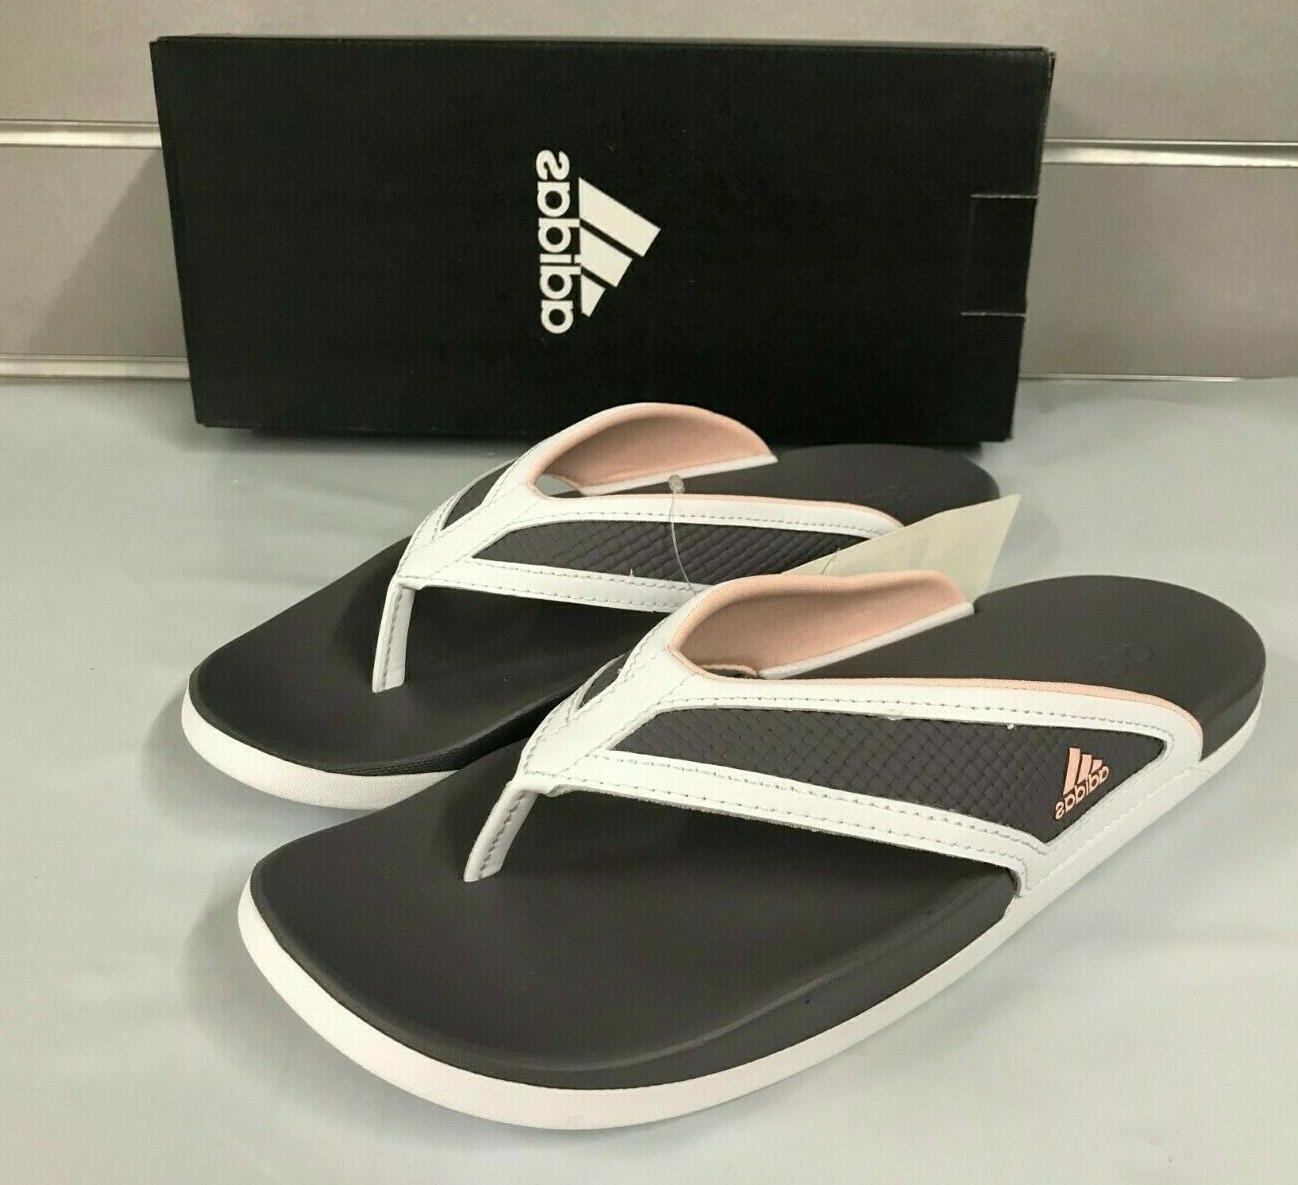 Adidas Womens Adilette CF+Summer Flip Flops GREY/PINK NEW